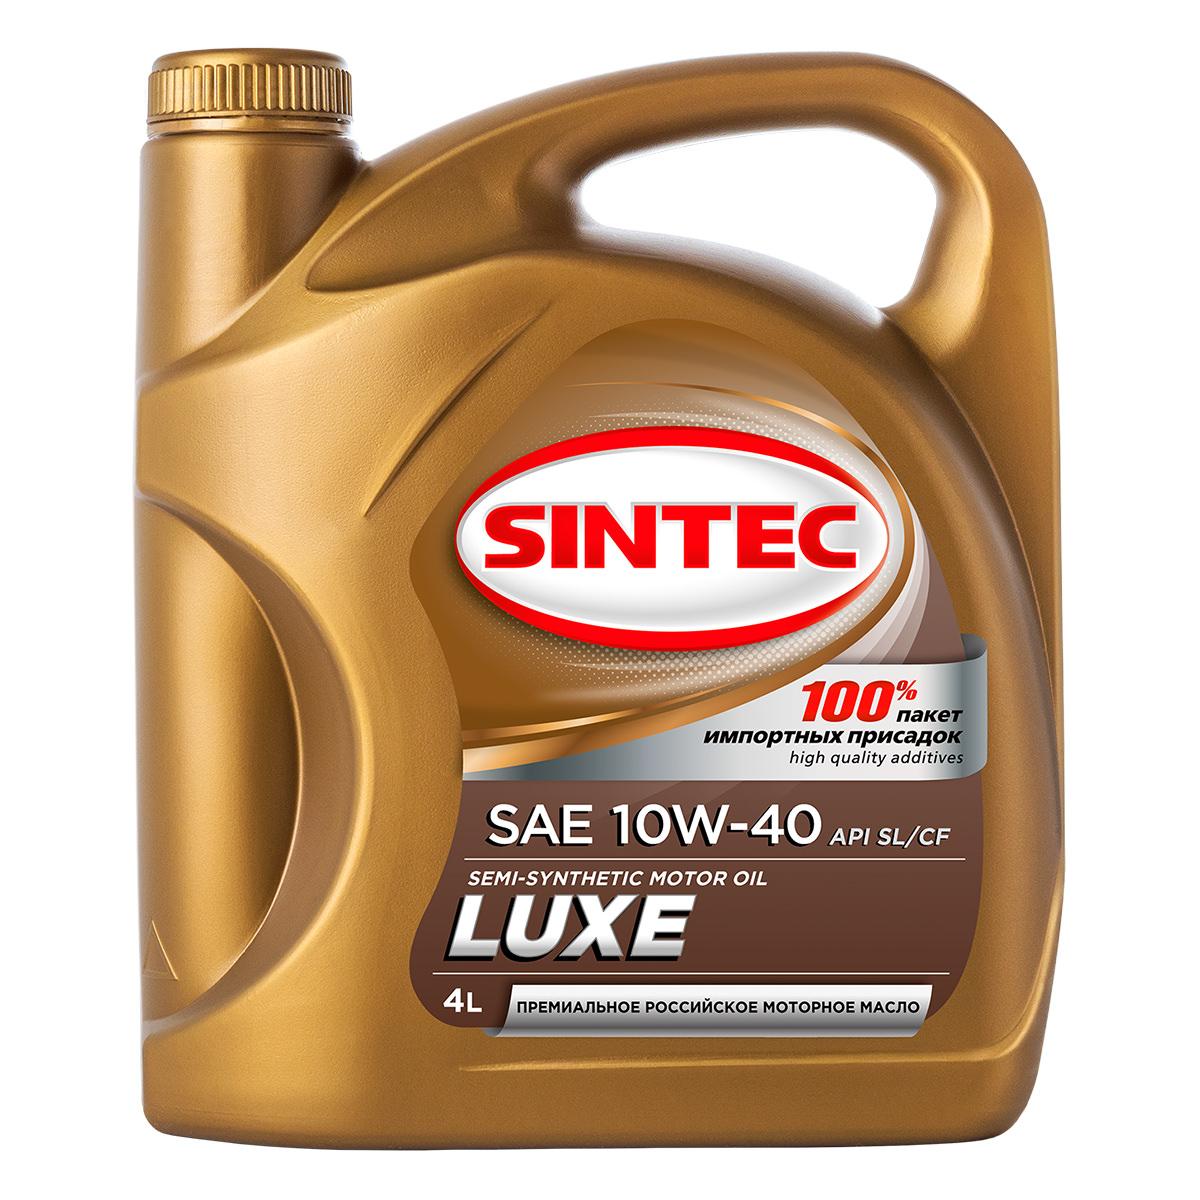 SINTEC LUXE SAE 10W-40 API SL/CF